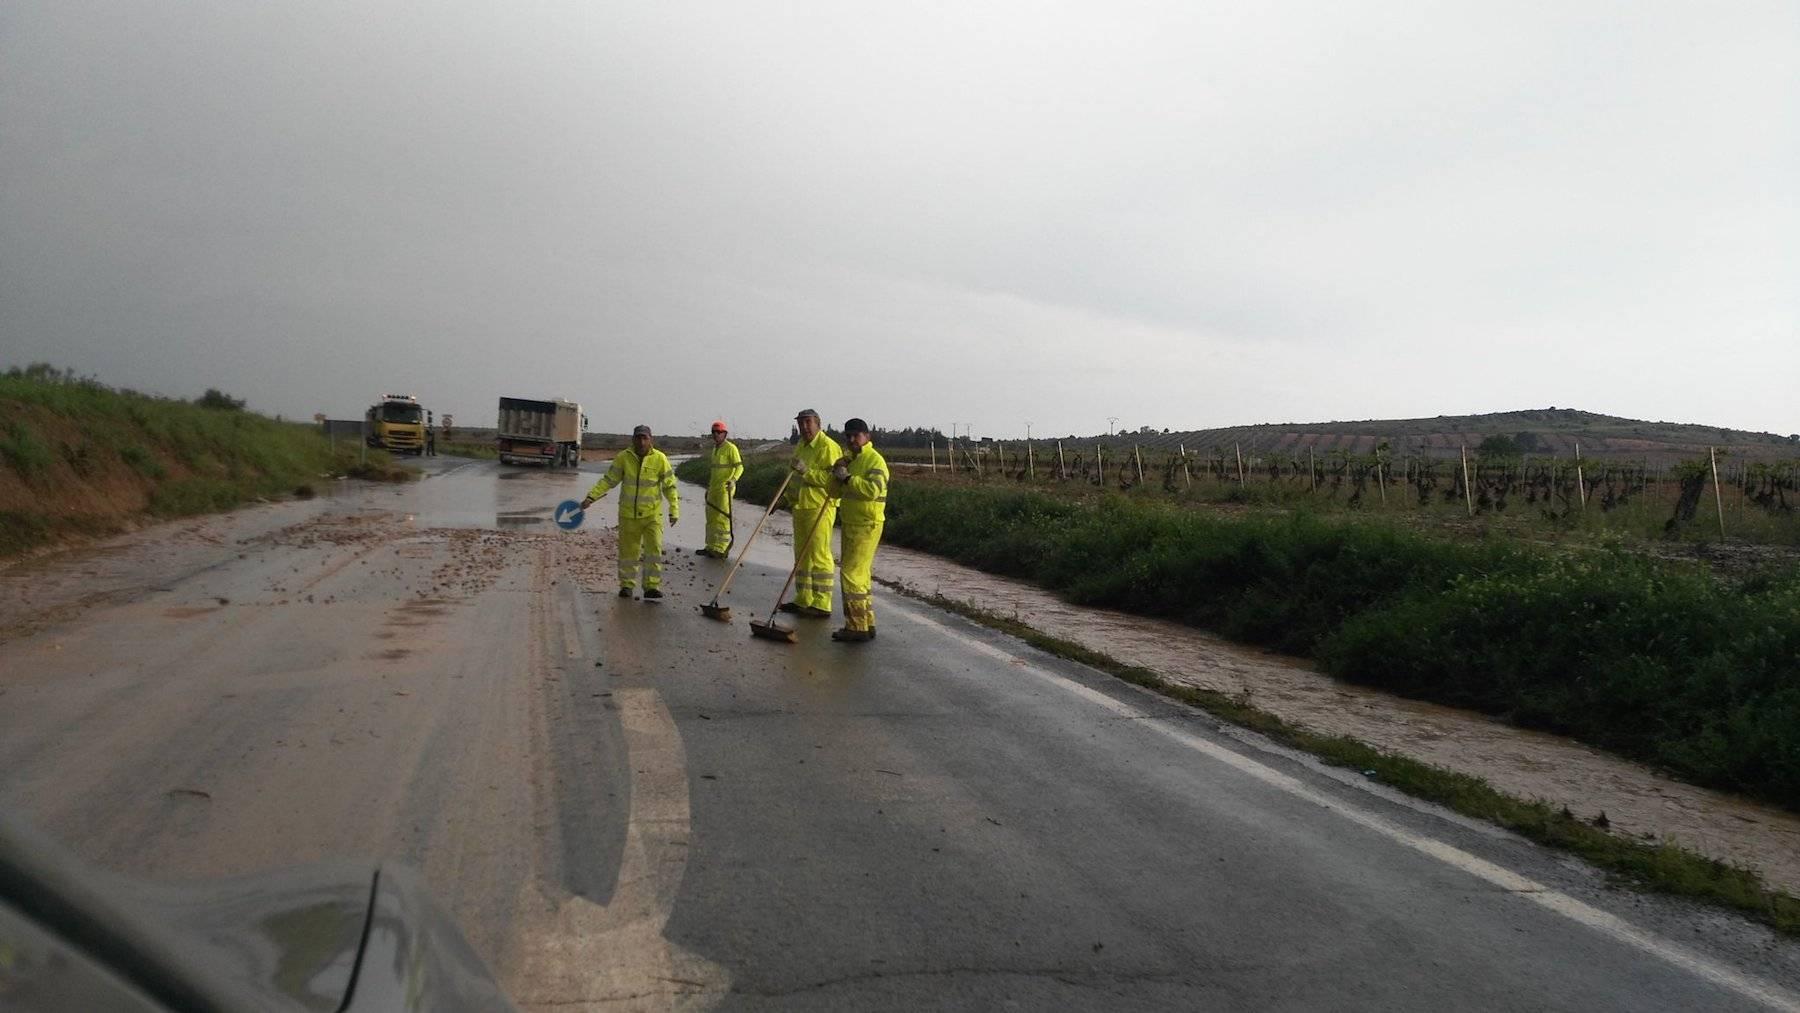 tromba agua herencia carreteras afectadas 4 - Una tromba de agua afectó a carreteras cercanas a Herencia